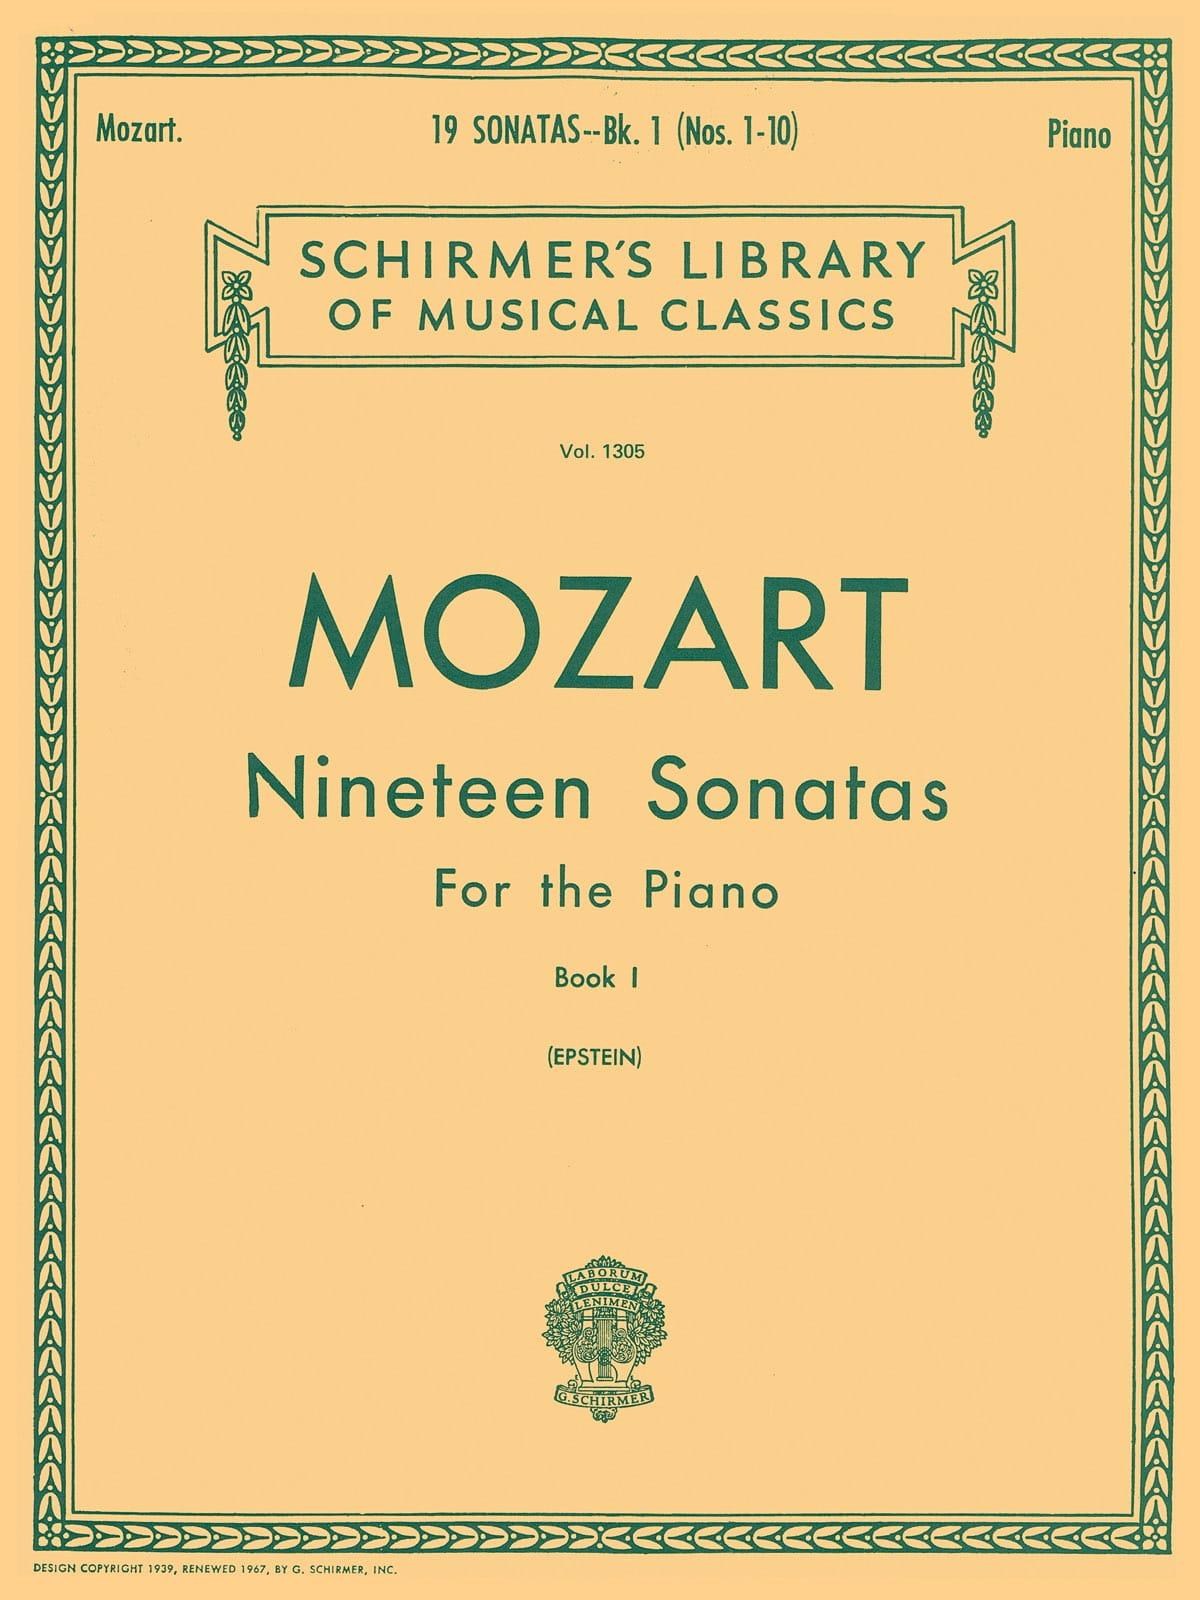 19 Sonates Volume 1 - MOZART - Partition - Piano - laflutedepan.com